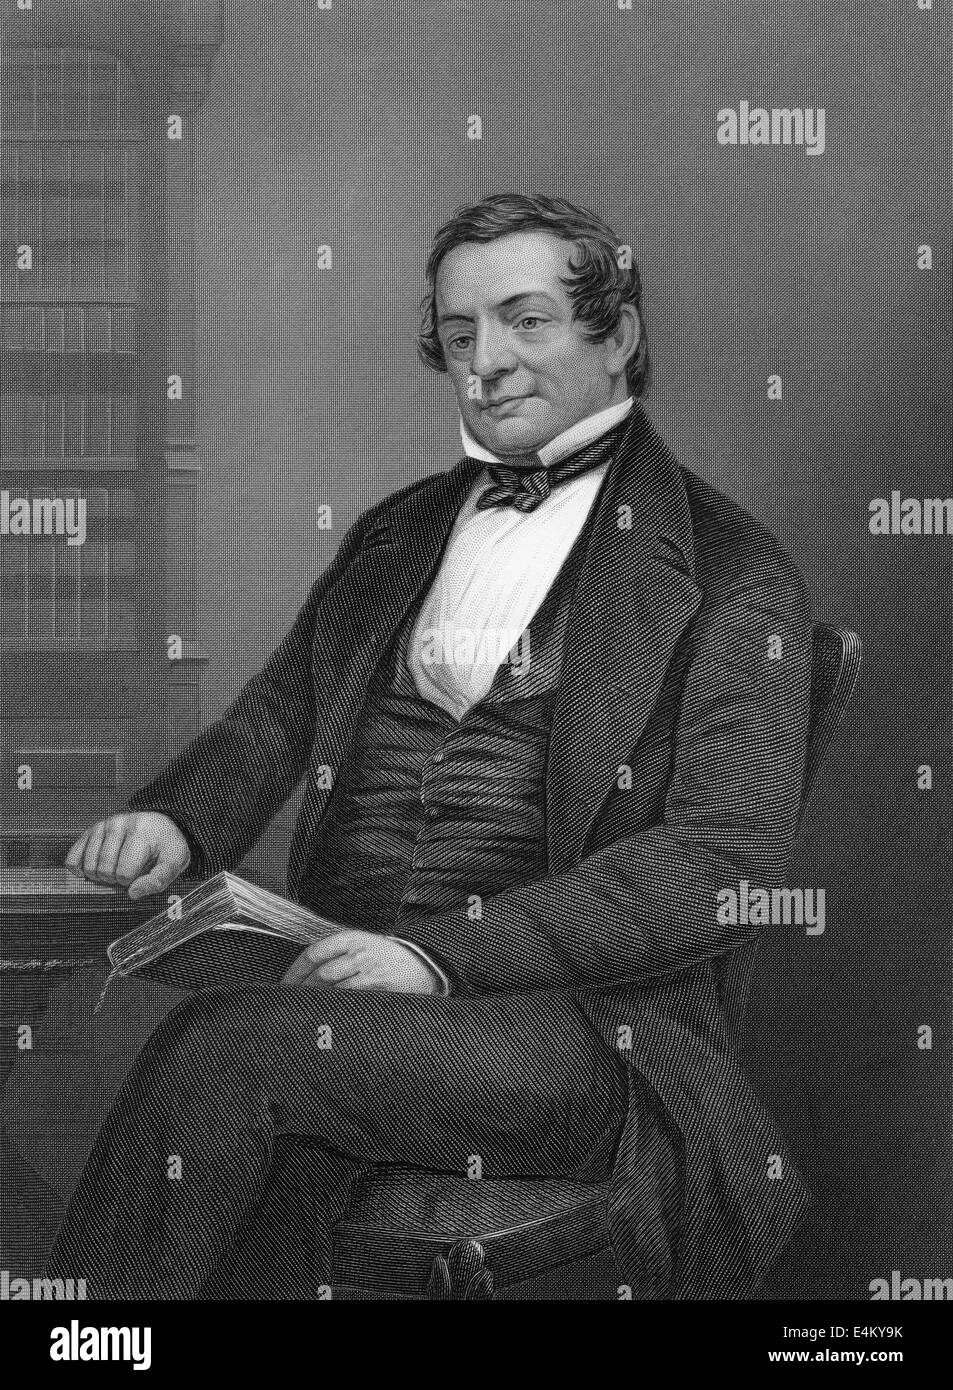 Washington Irving, 1783 - 1859, an American author and diplomat, - Stock Image